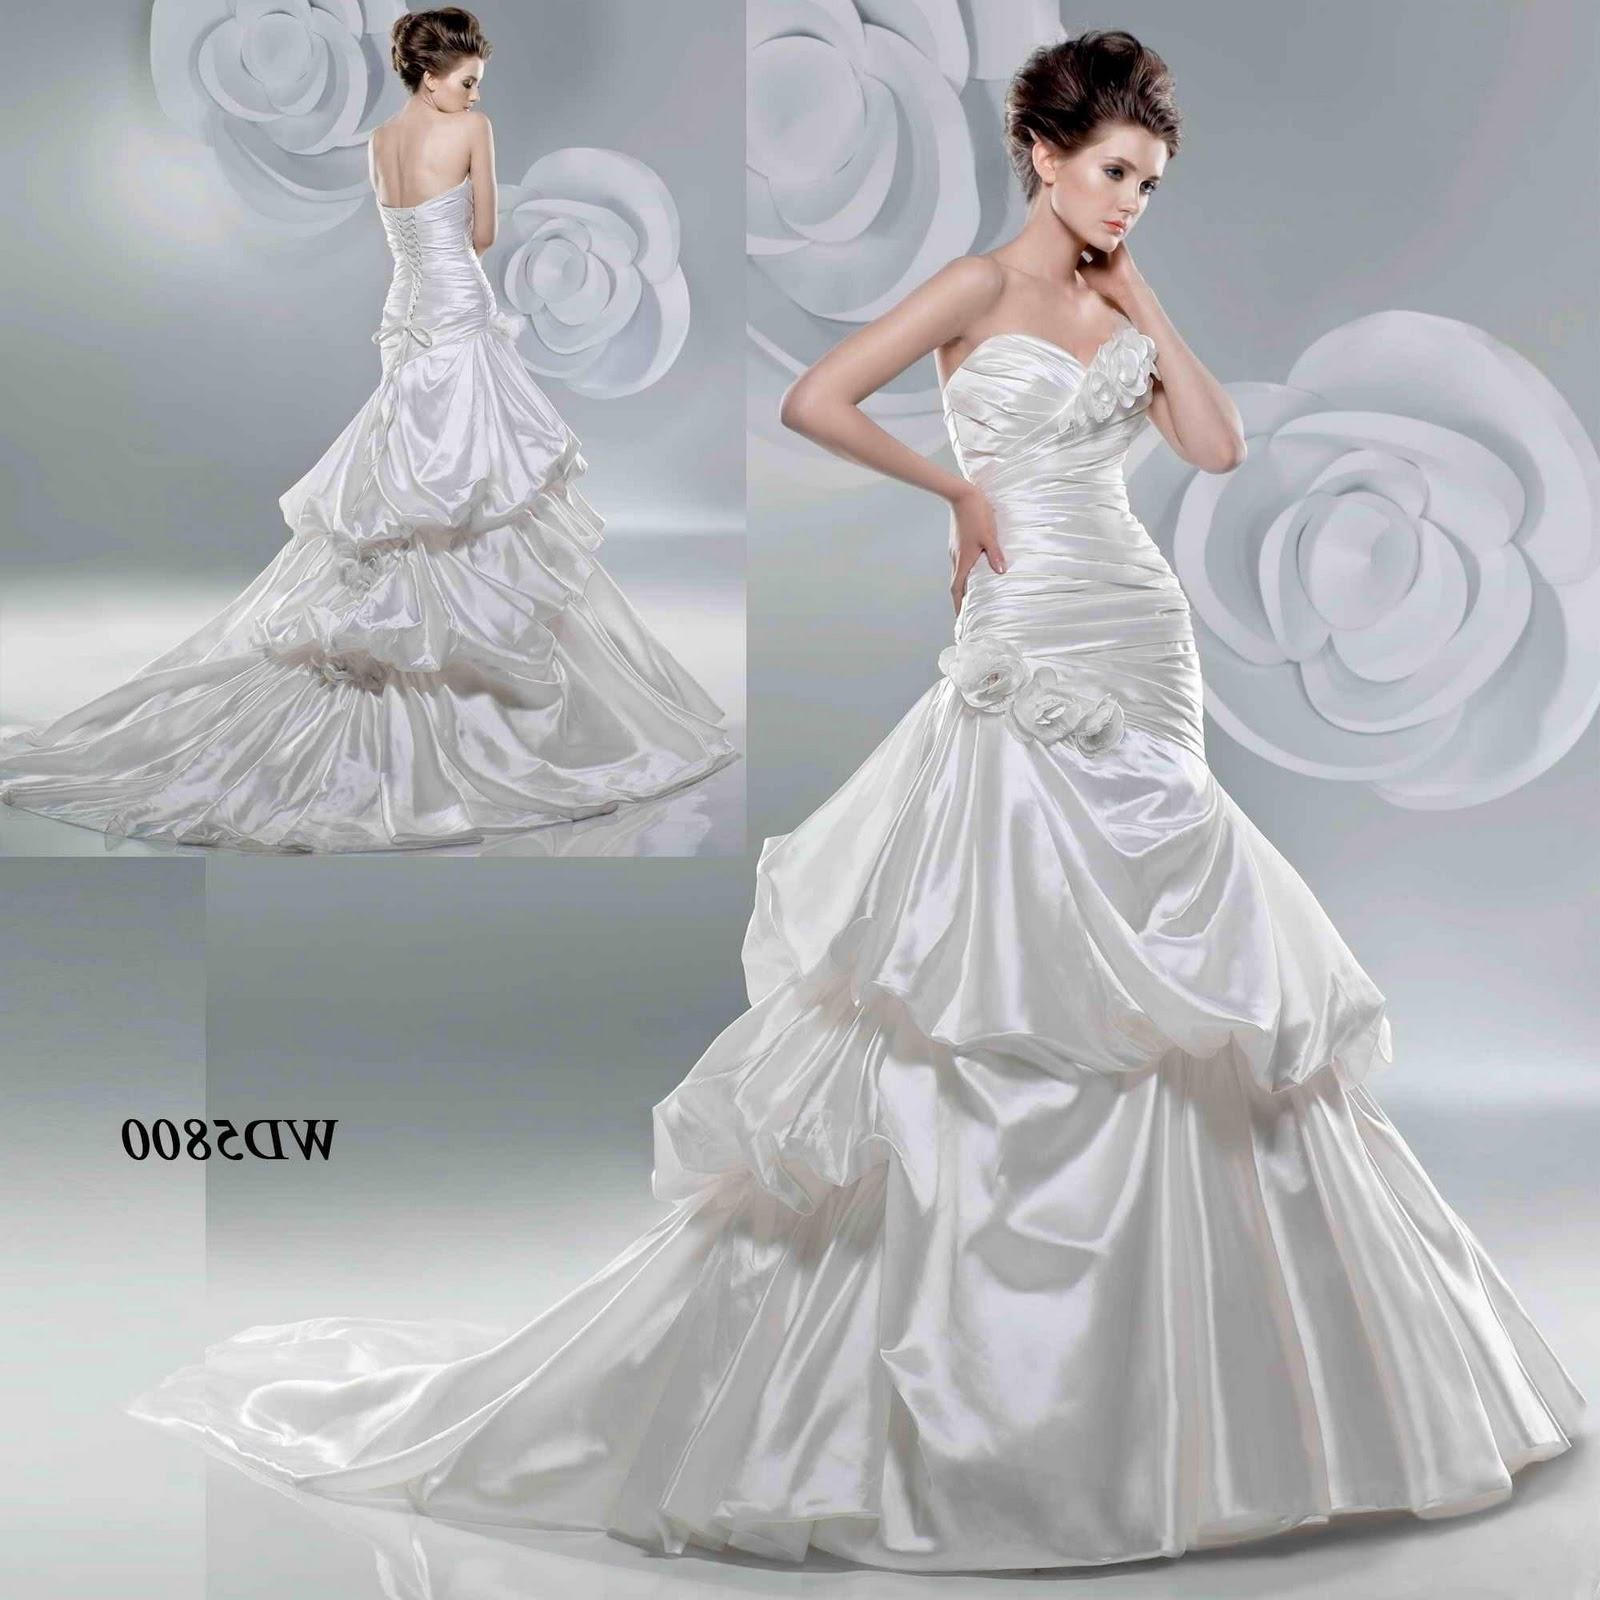 Wedding Dress Gown  WD5800